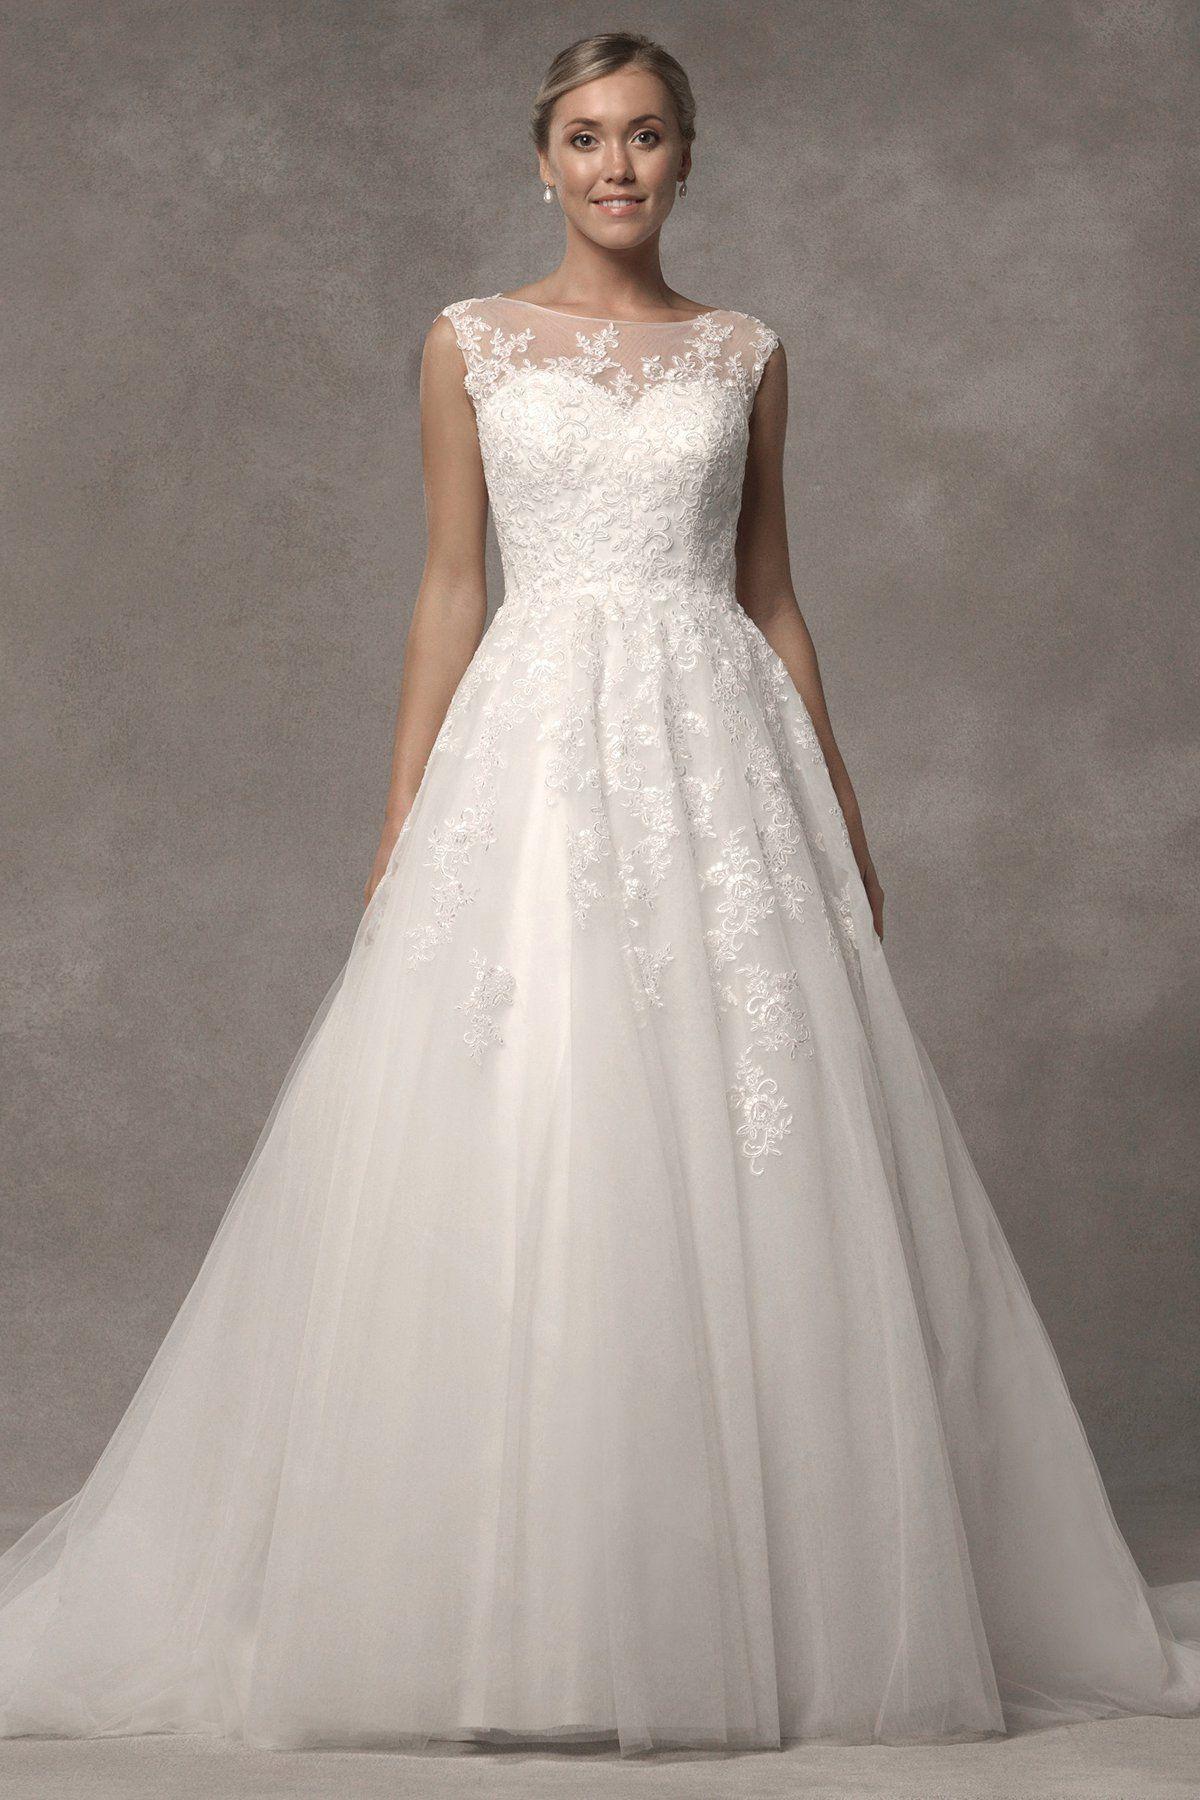 Belles wedding dress  Style  by LQ Designs  Find Your Dream Dress  Wedding BELLEs